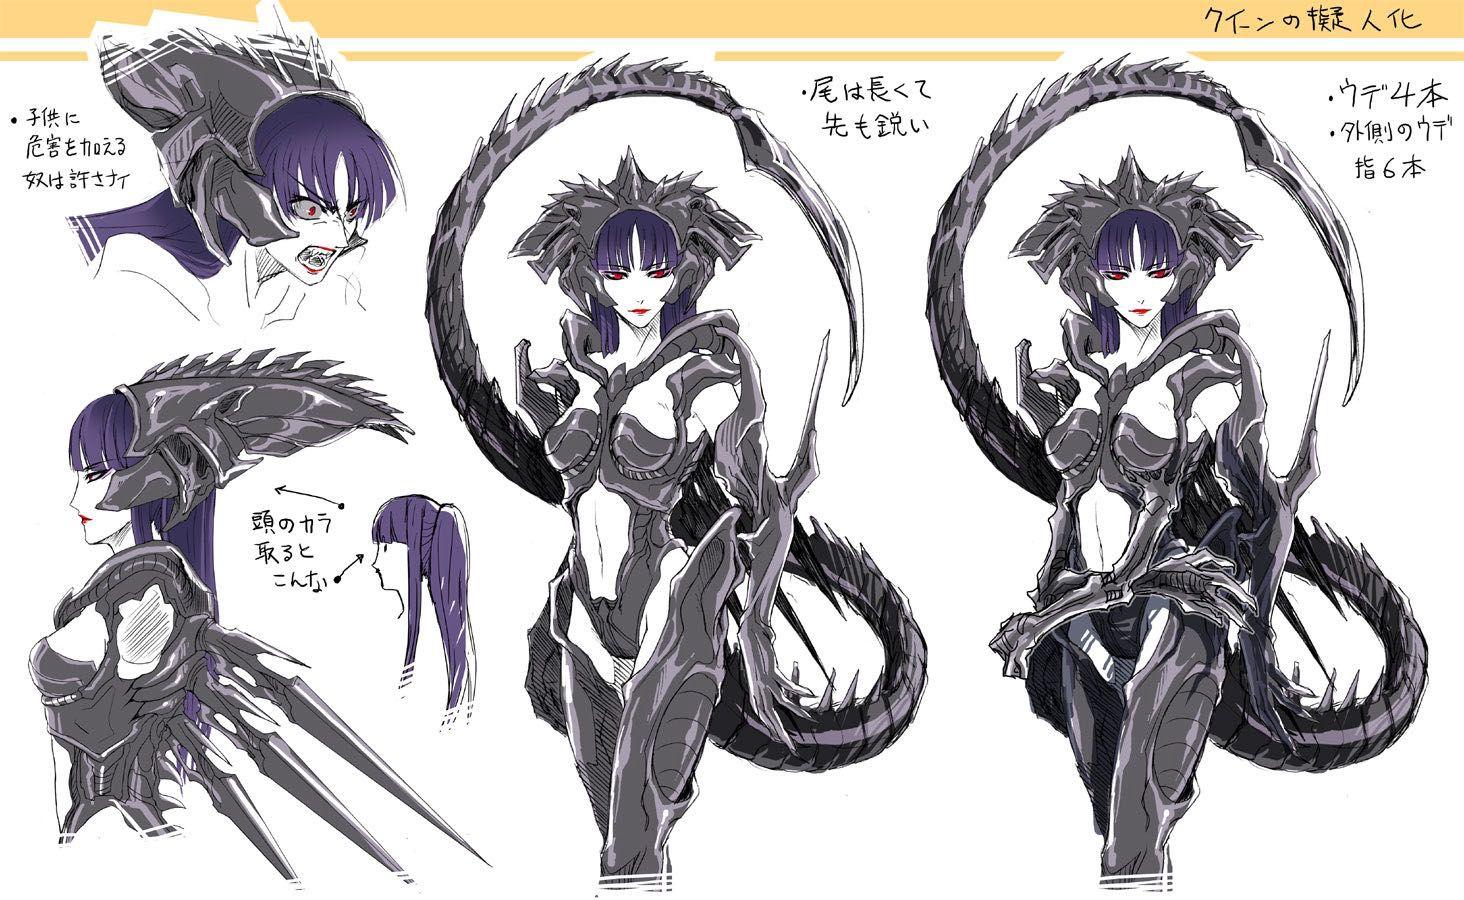 Female Anime Characters Male Reader : Yandere females male reader female xenomorph